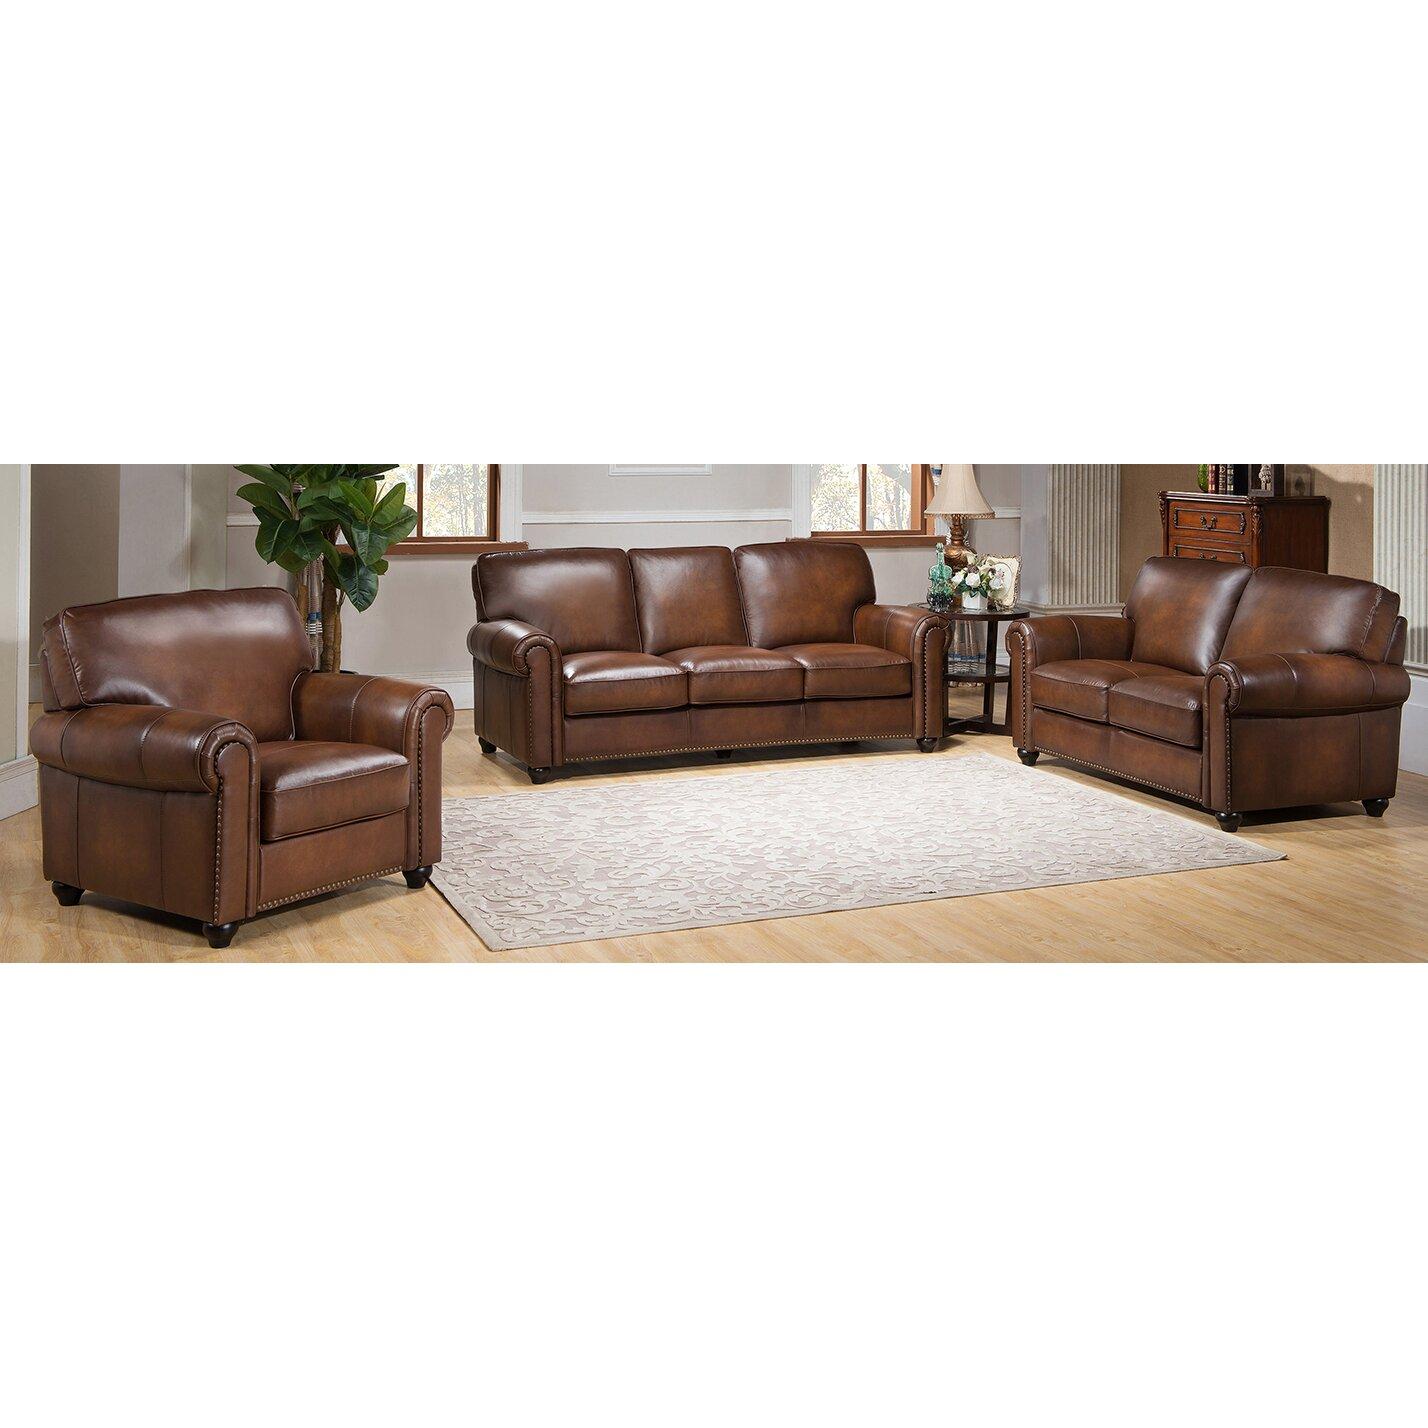 Amax aspen 3 piece leather living room set - Piece living room set ...